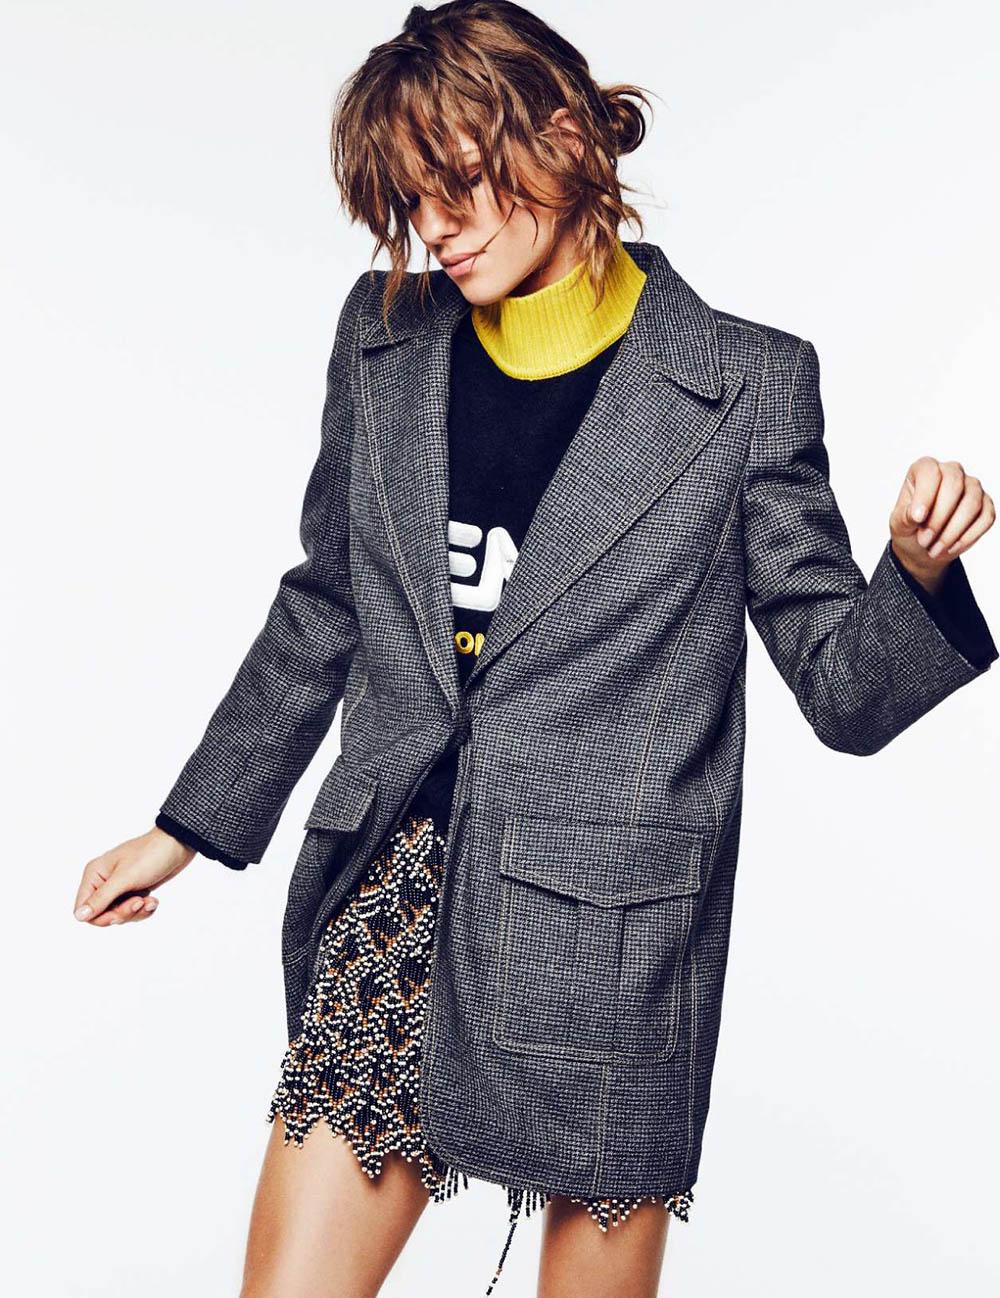 Lisa Louis by Rafa Gallar for Elle France January 25th, 2019